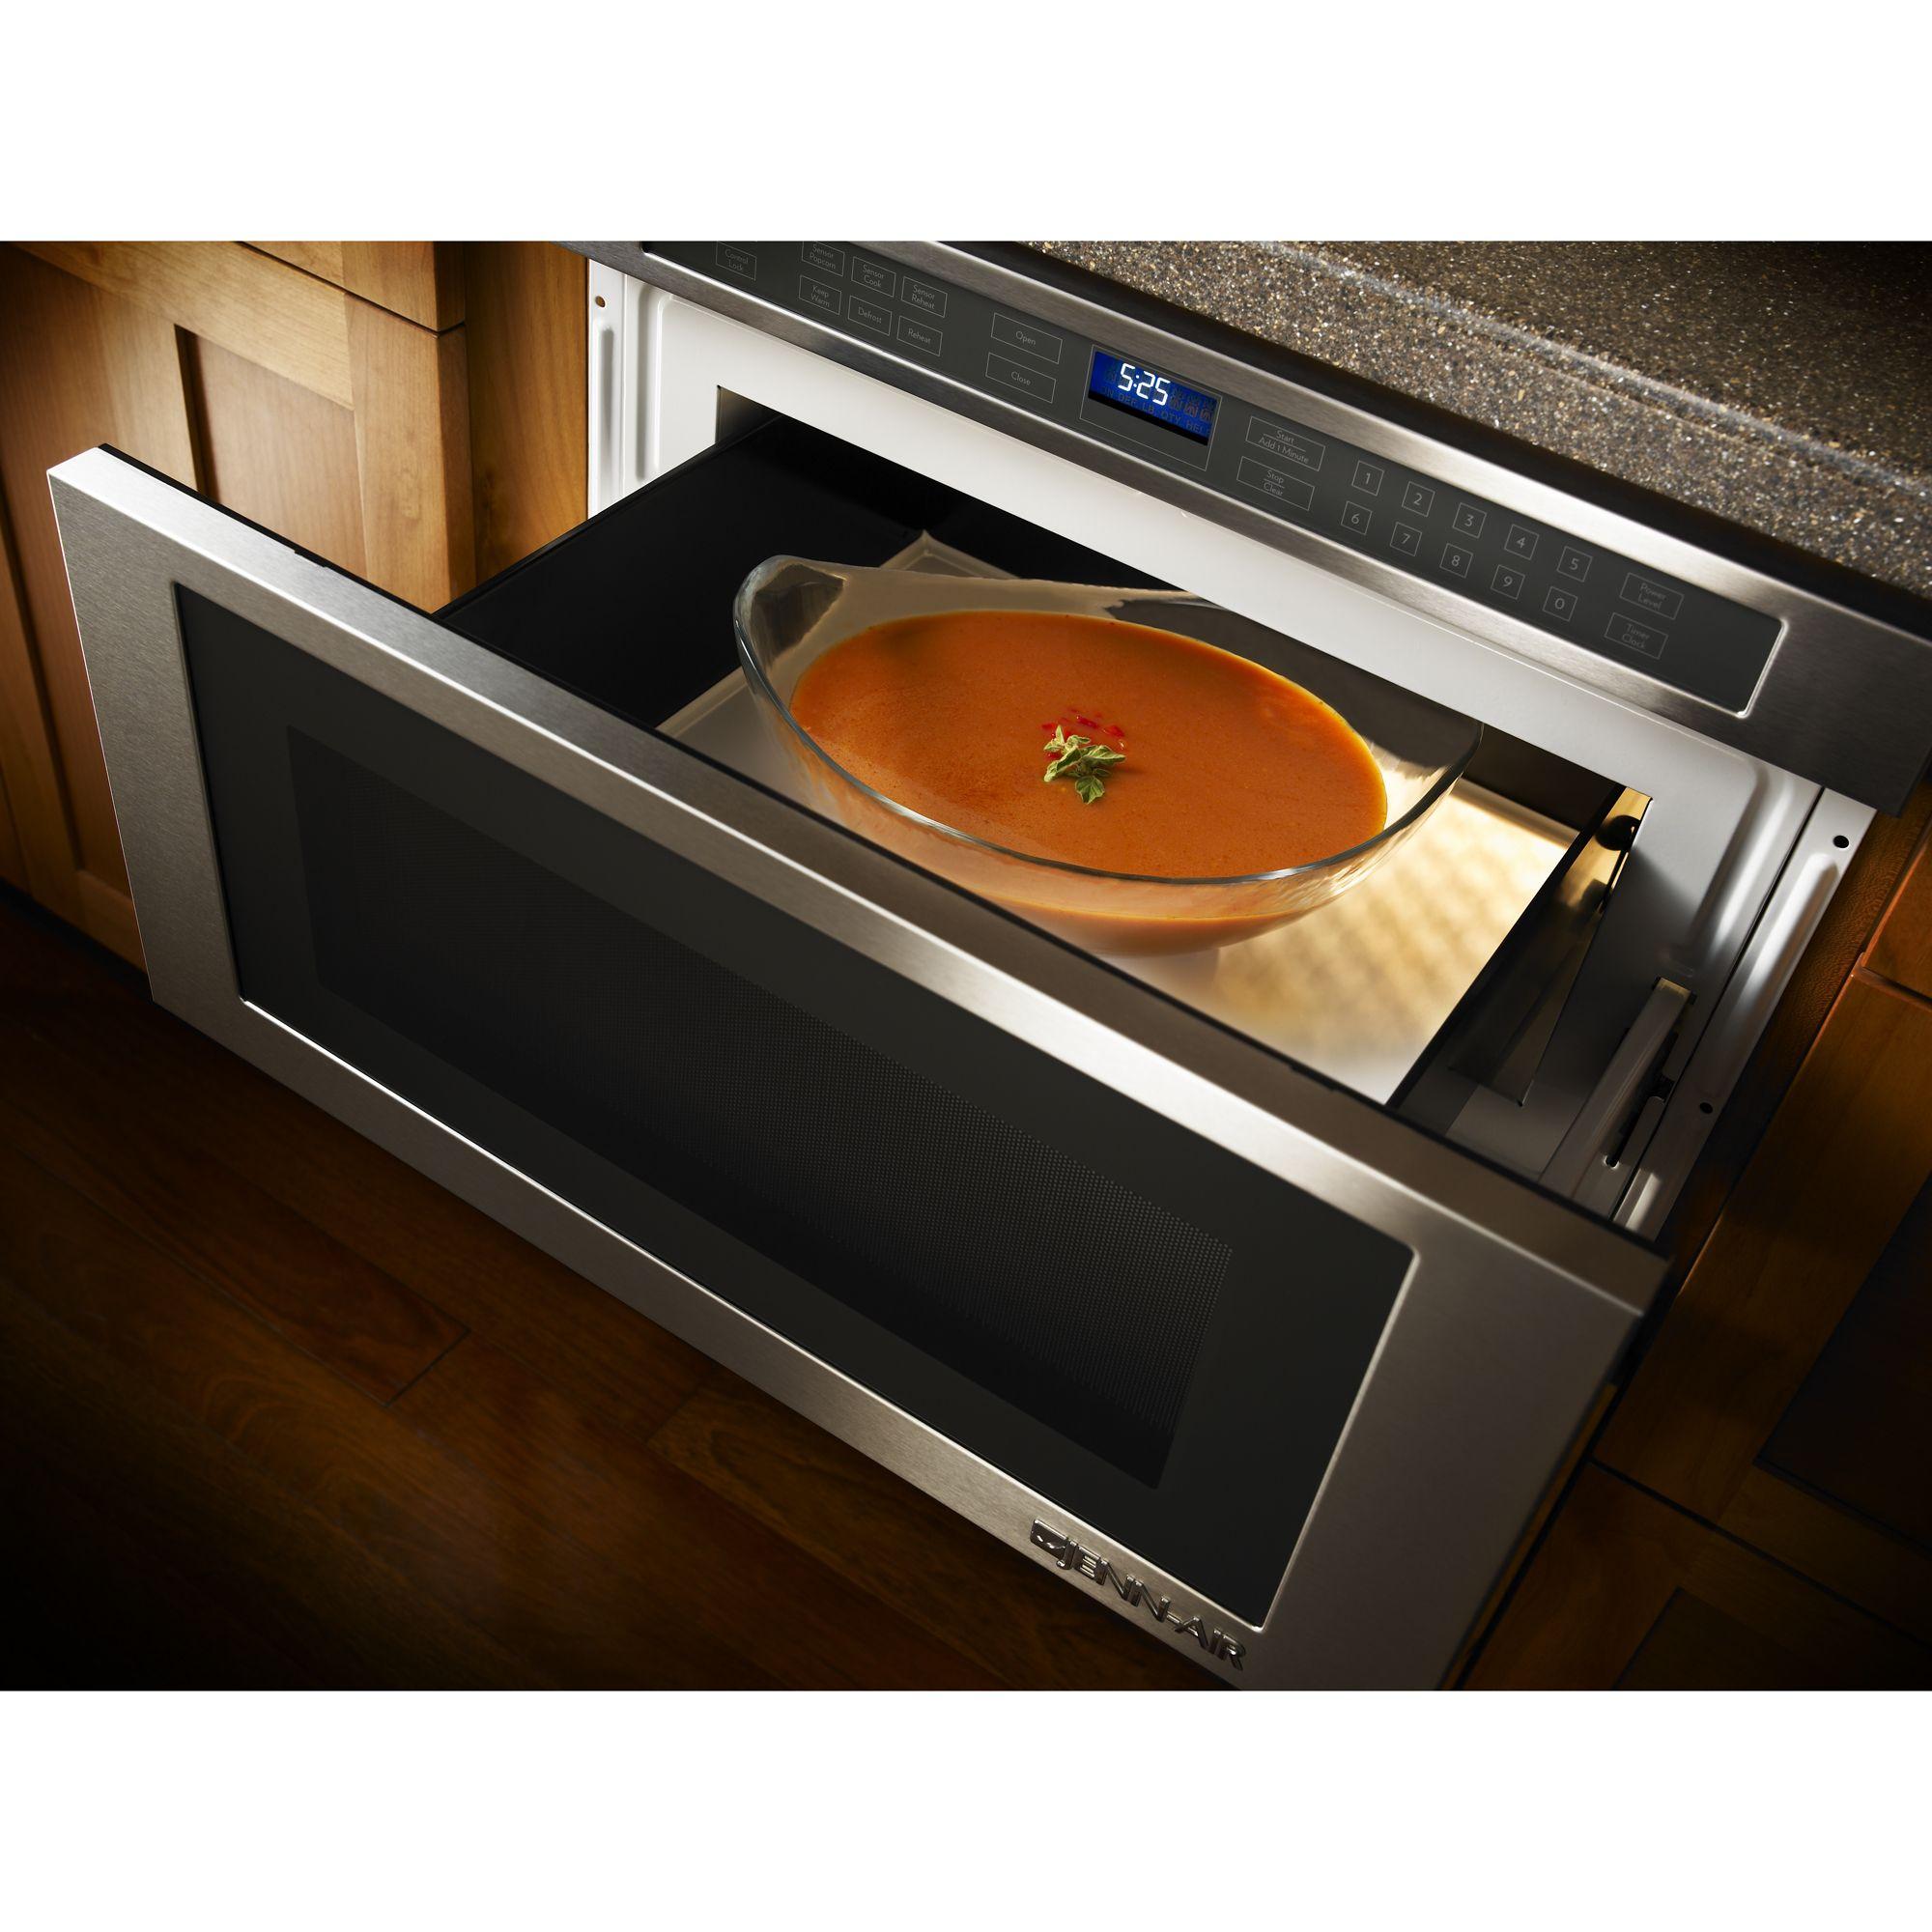 "Jenn-Air 24"" 1.0 cu. ft. Microwave Drawer Oven"